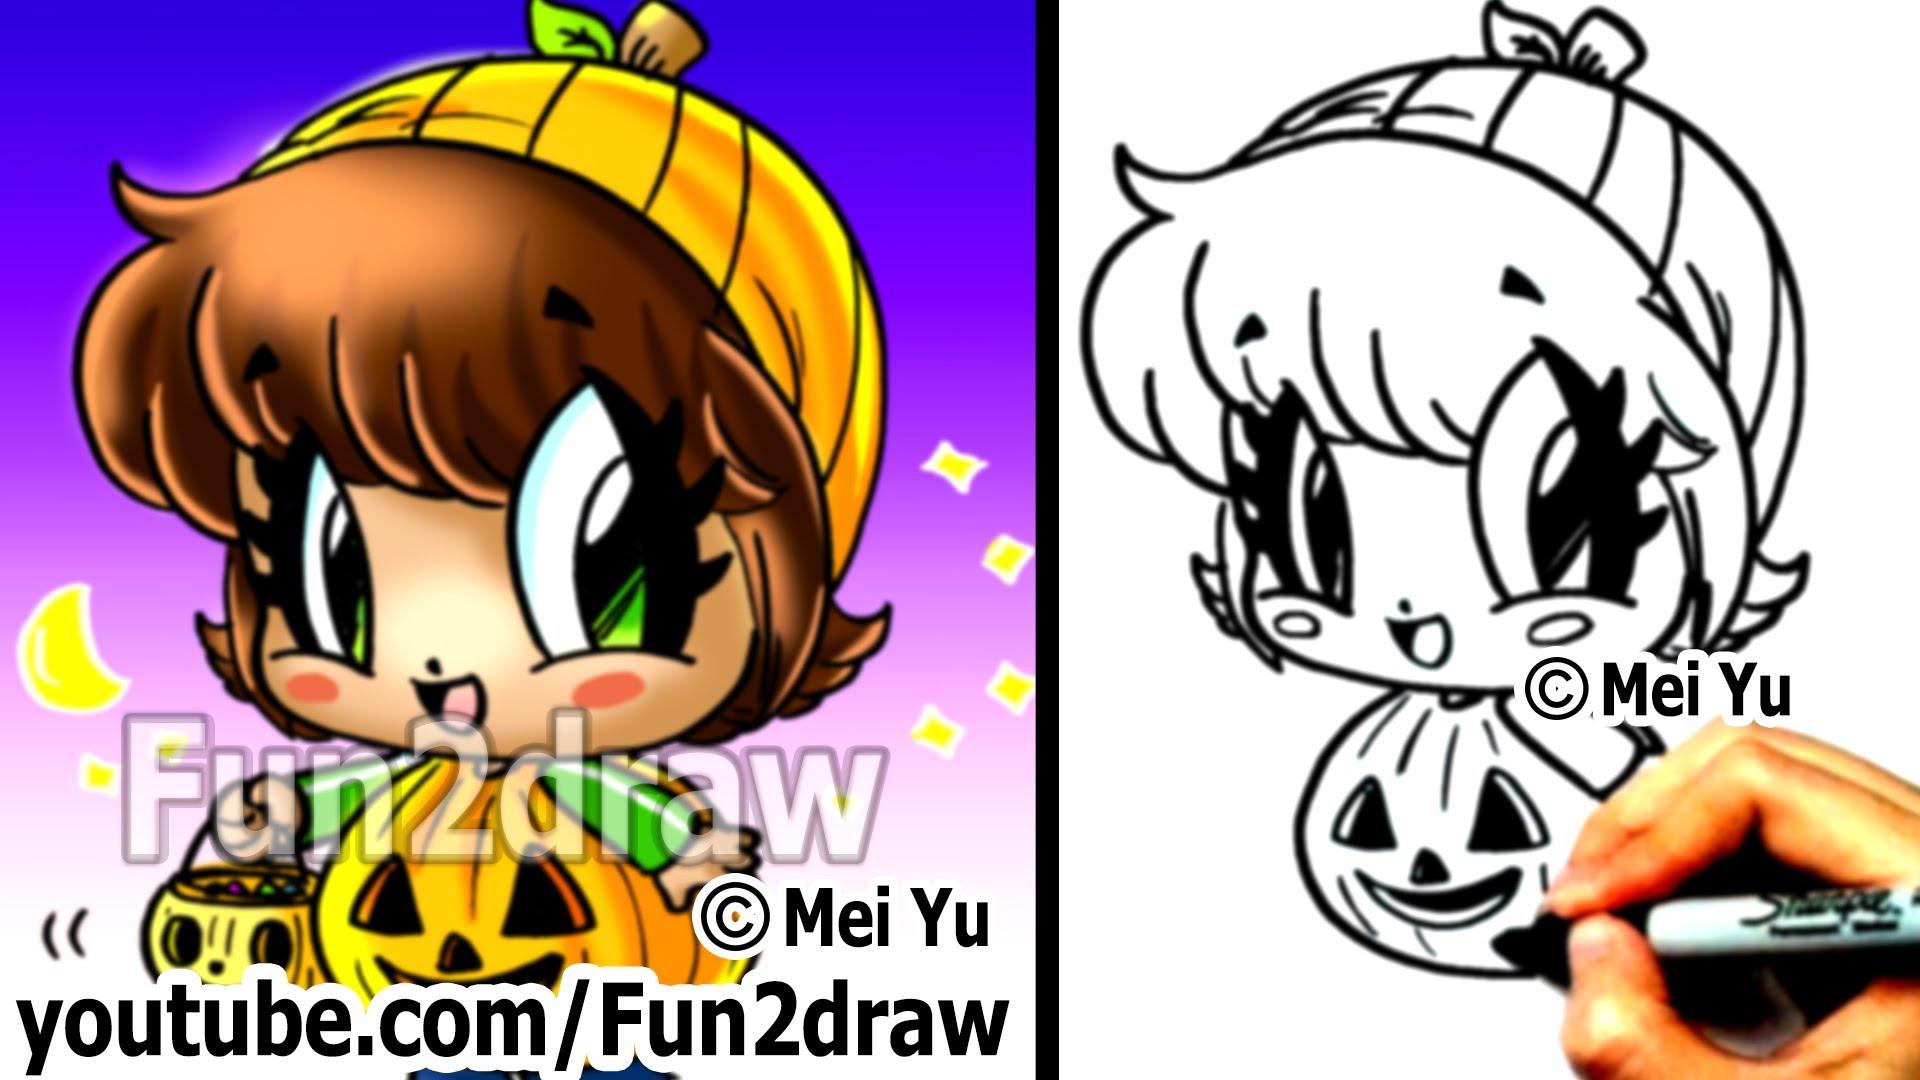 Drawn pumpkin fun2draw People Draw to How How